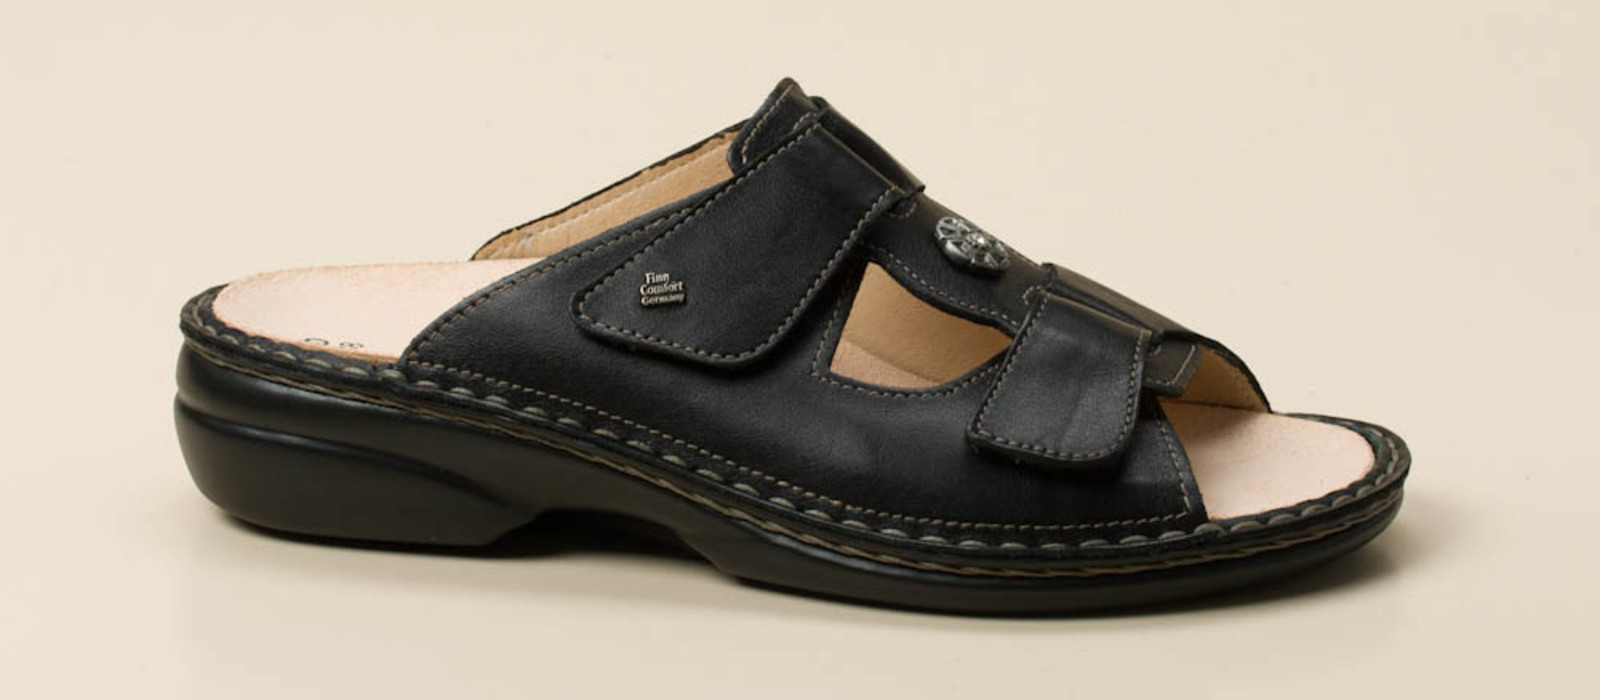 finn comfort damen pantolette in schwarz kaufen zumnorde online shop. Black Bedroom Furniture Sets. Home Design Ideas